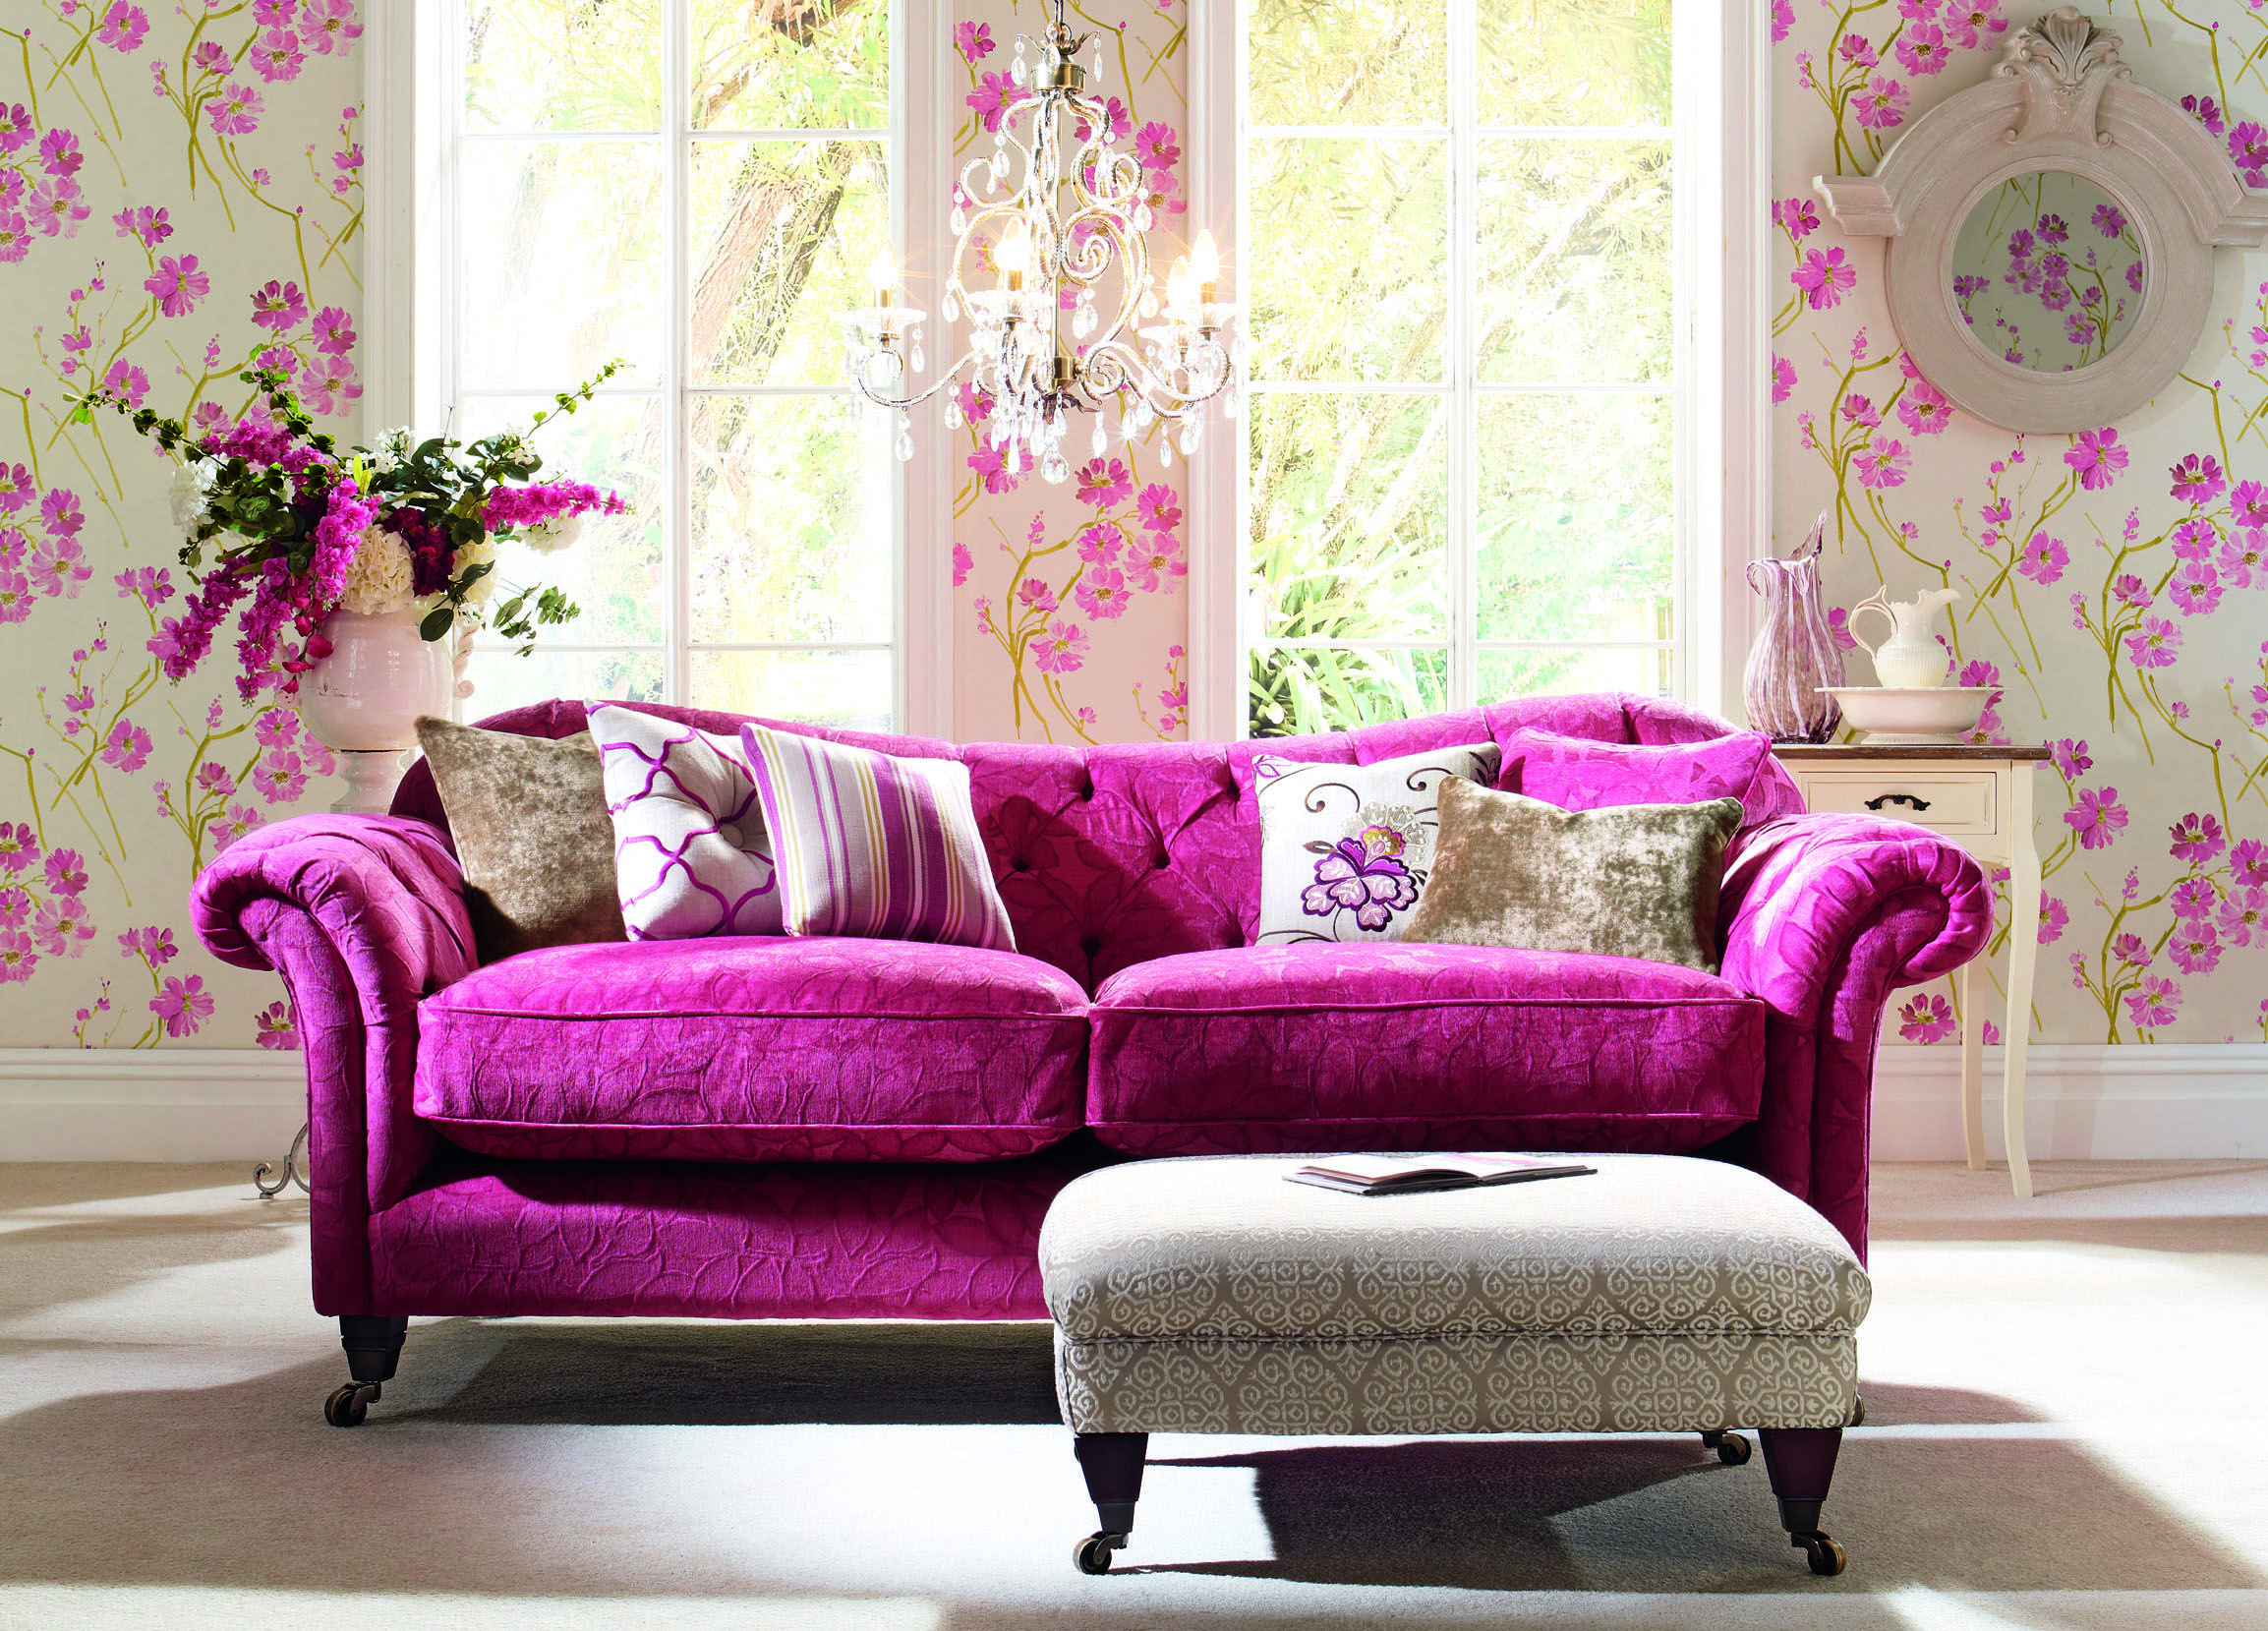 Sofa reupholstered in Elite Crocus Spring living room